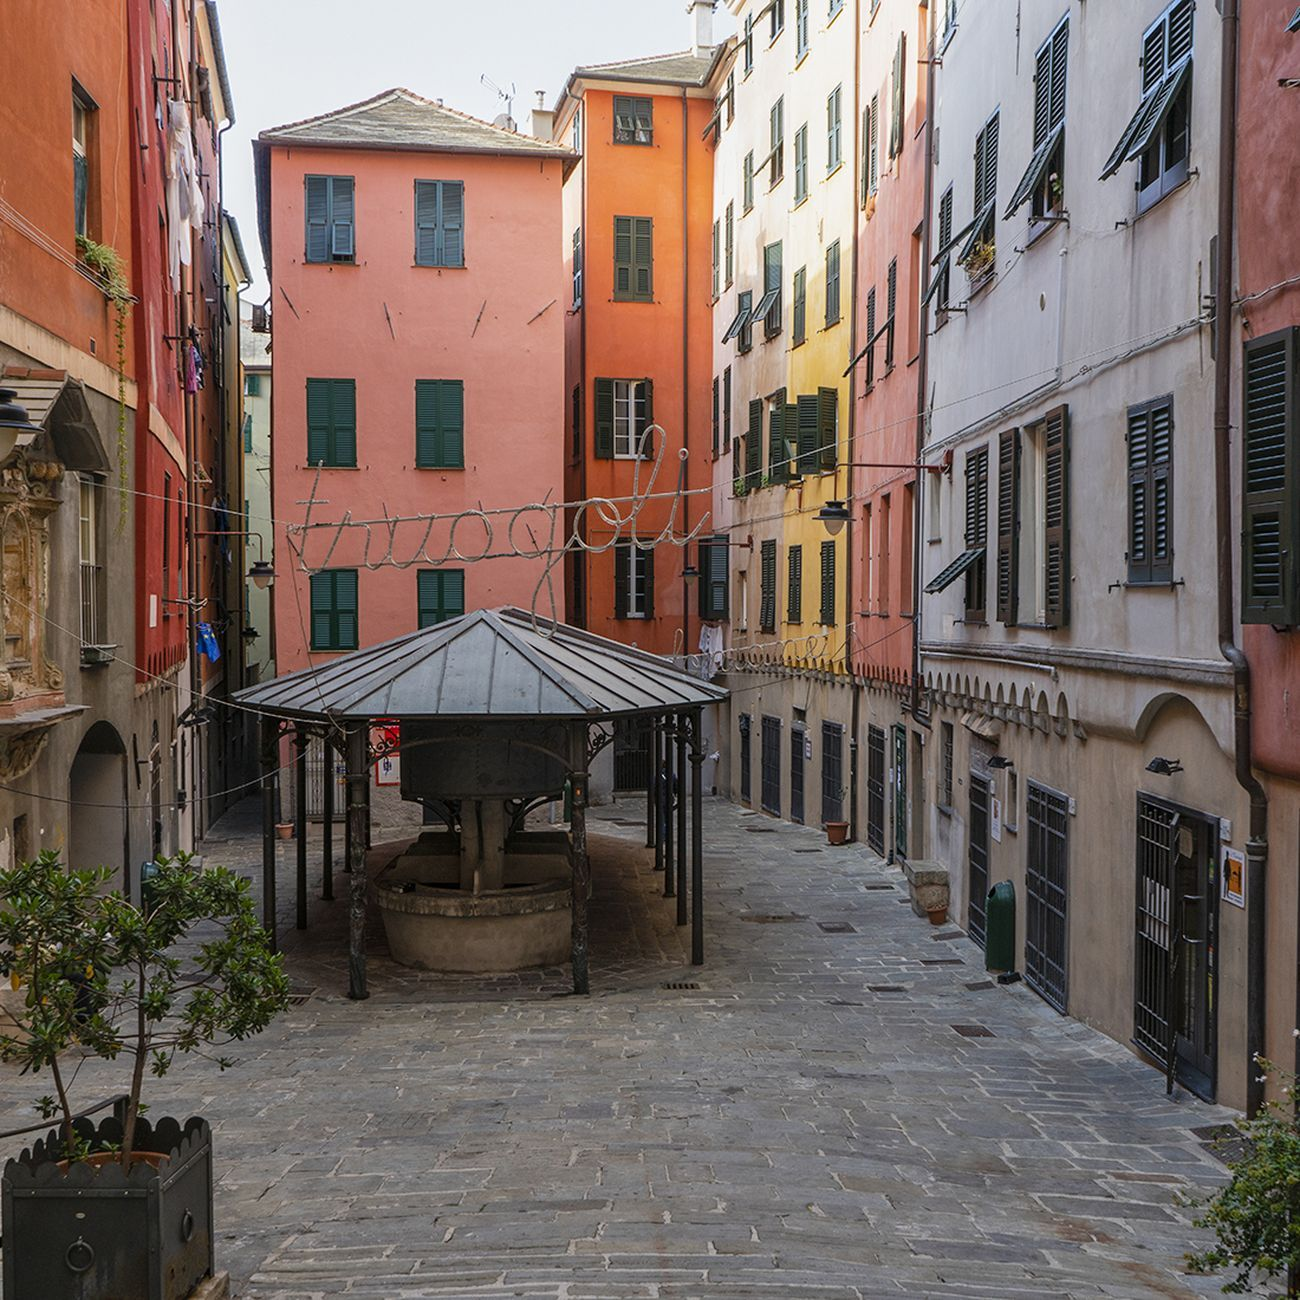 Genova, 2020. Photo Emanuele Piccardo